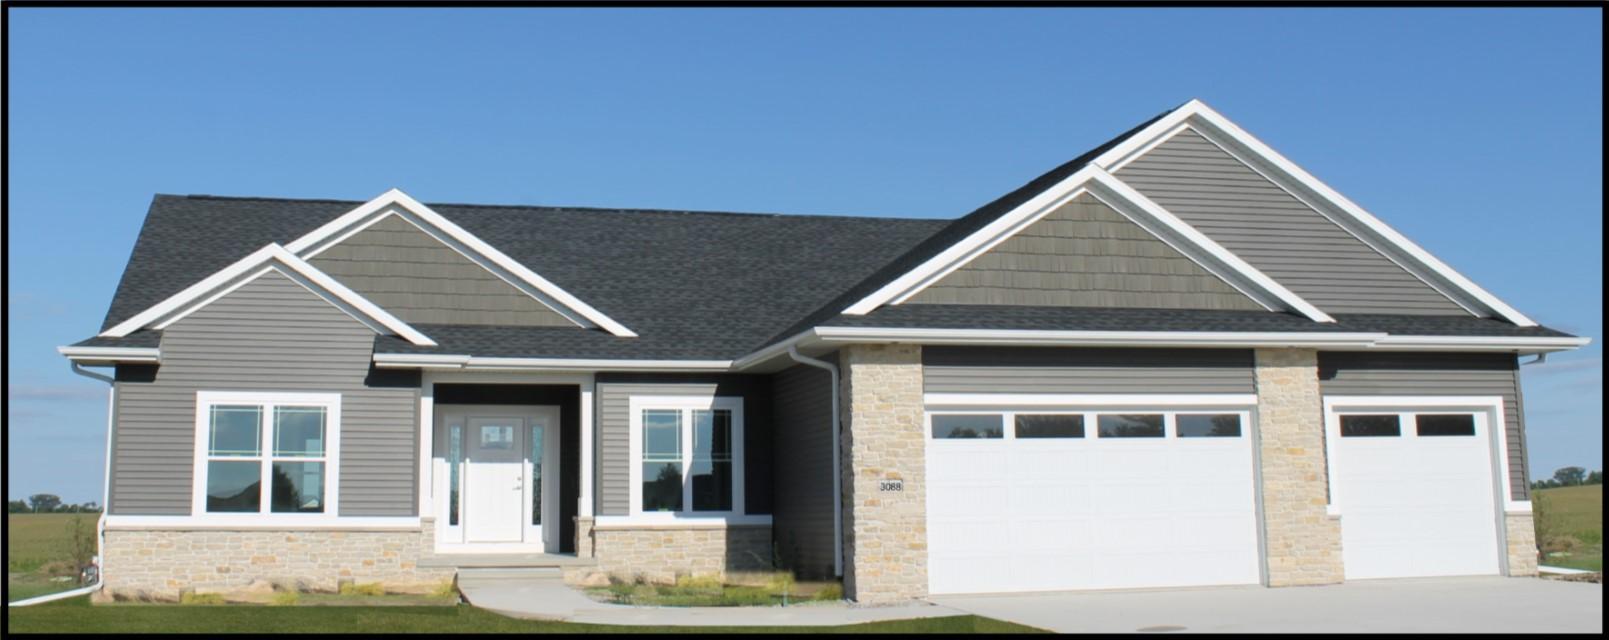 2018 Fall Parade of Homes Entry